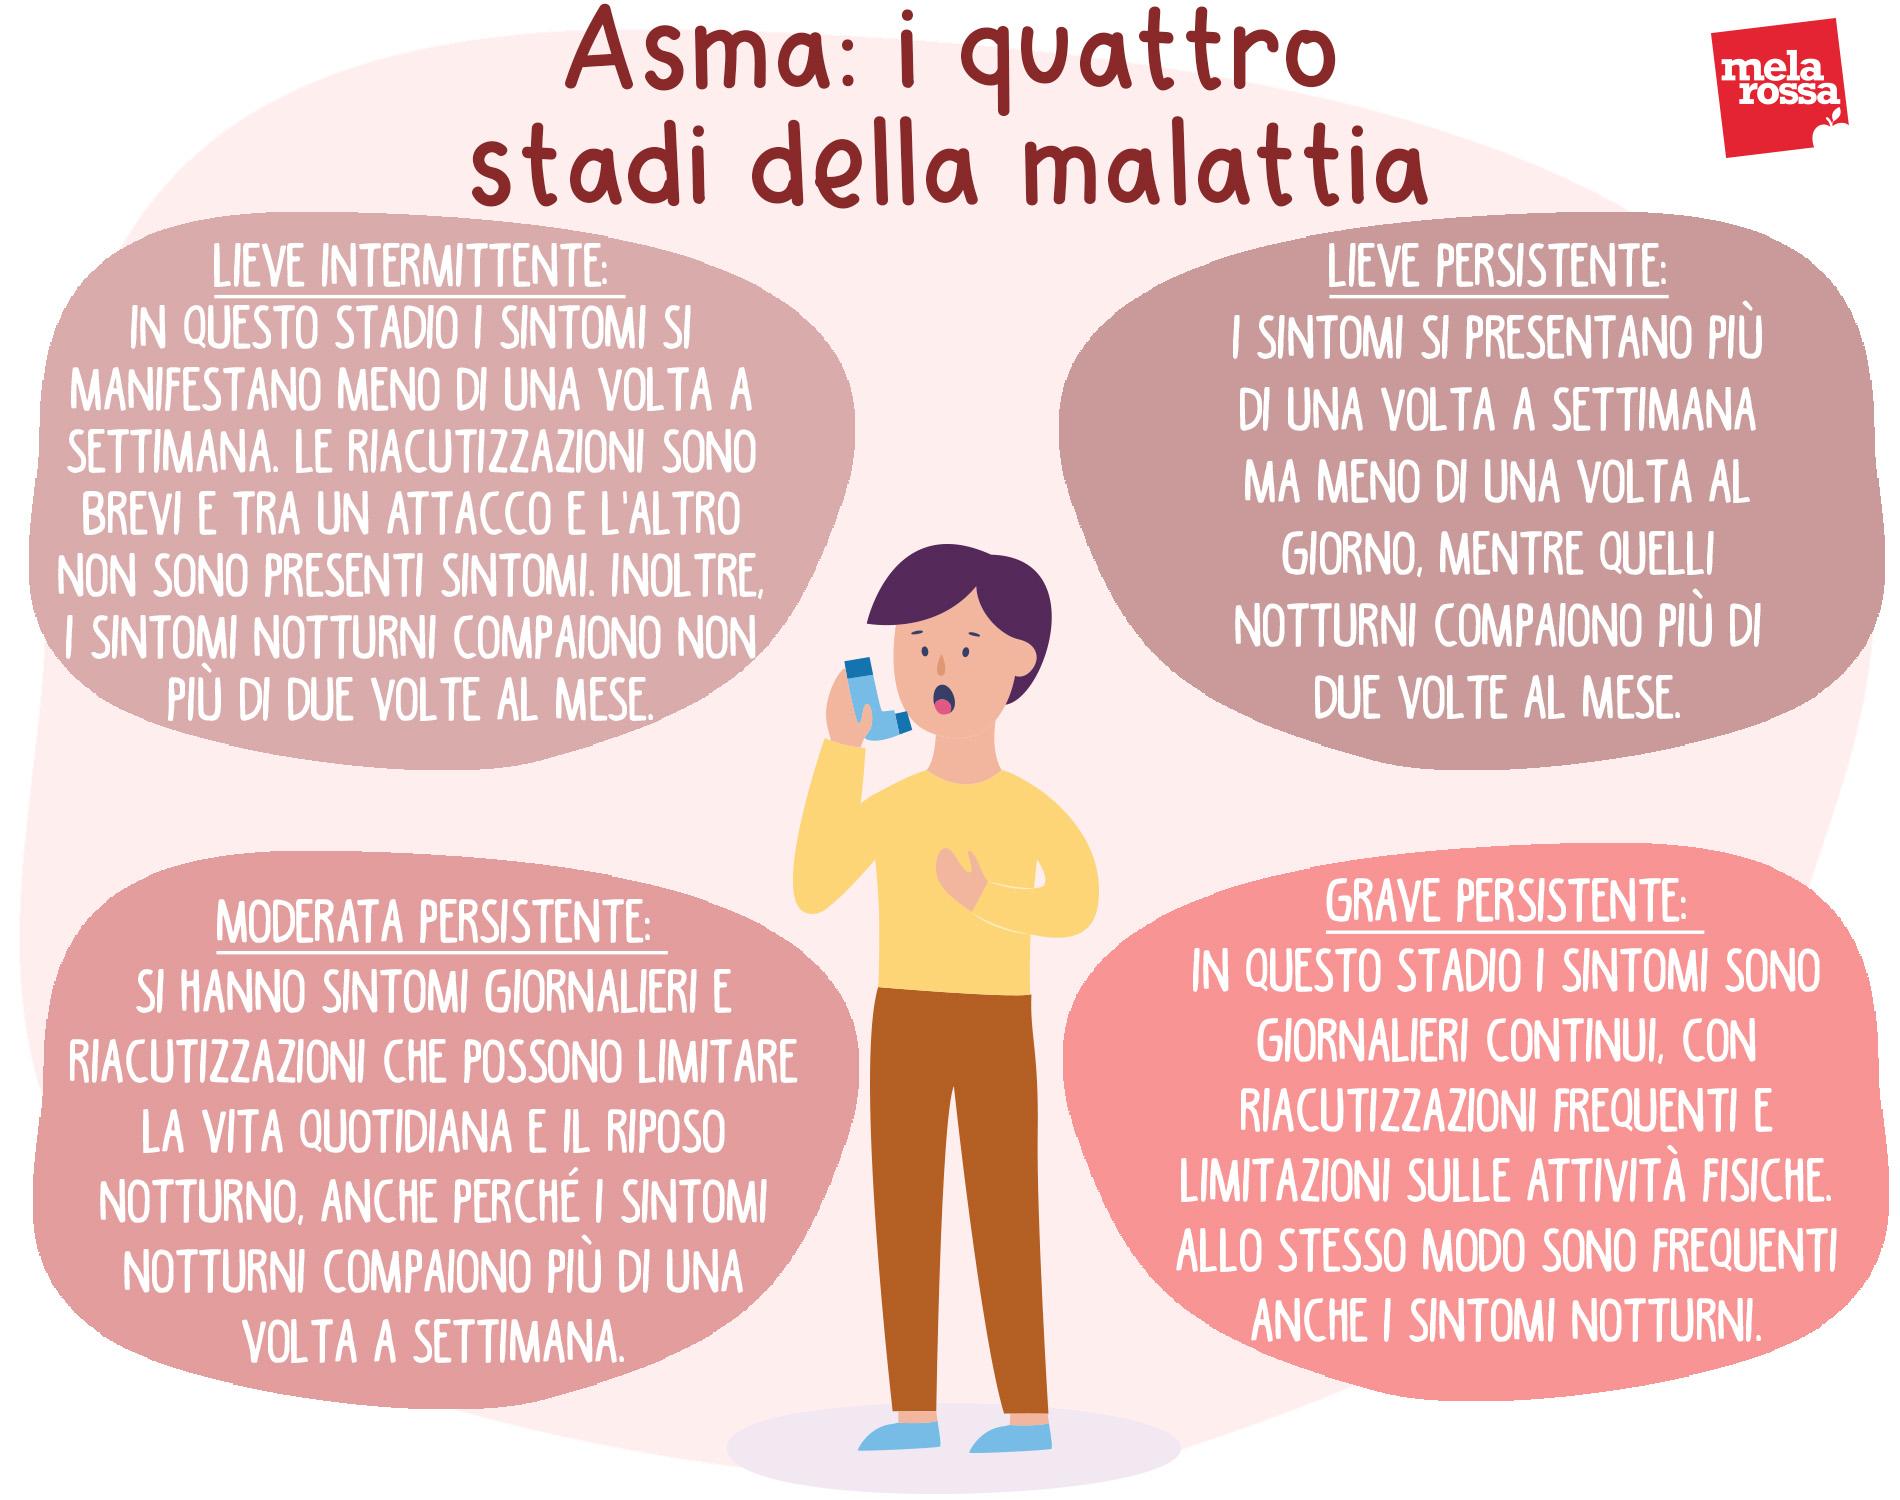 asma: stadi della malattia